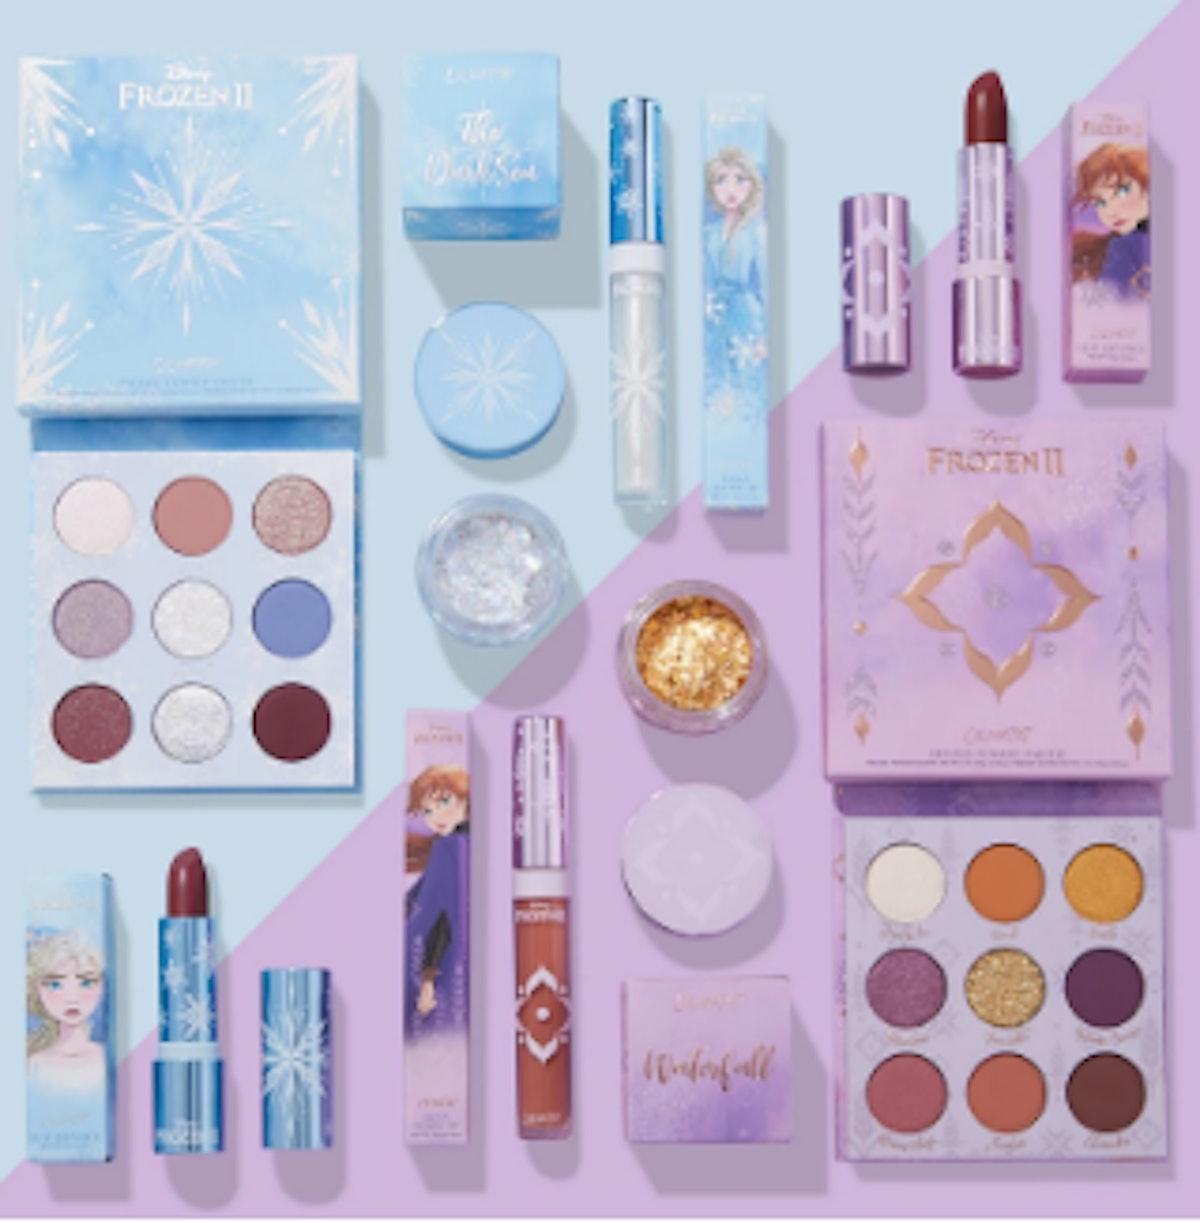 Frozen II Collection